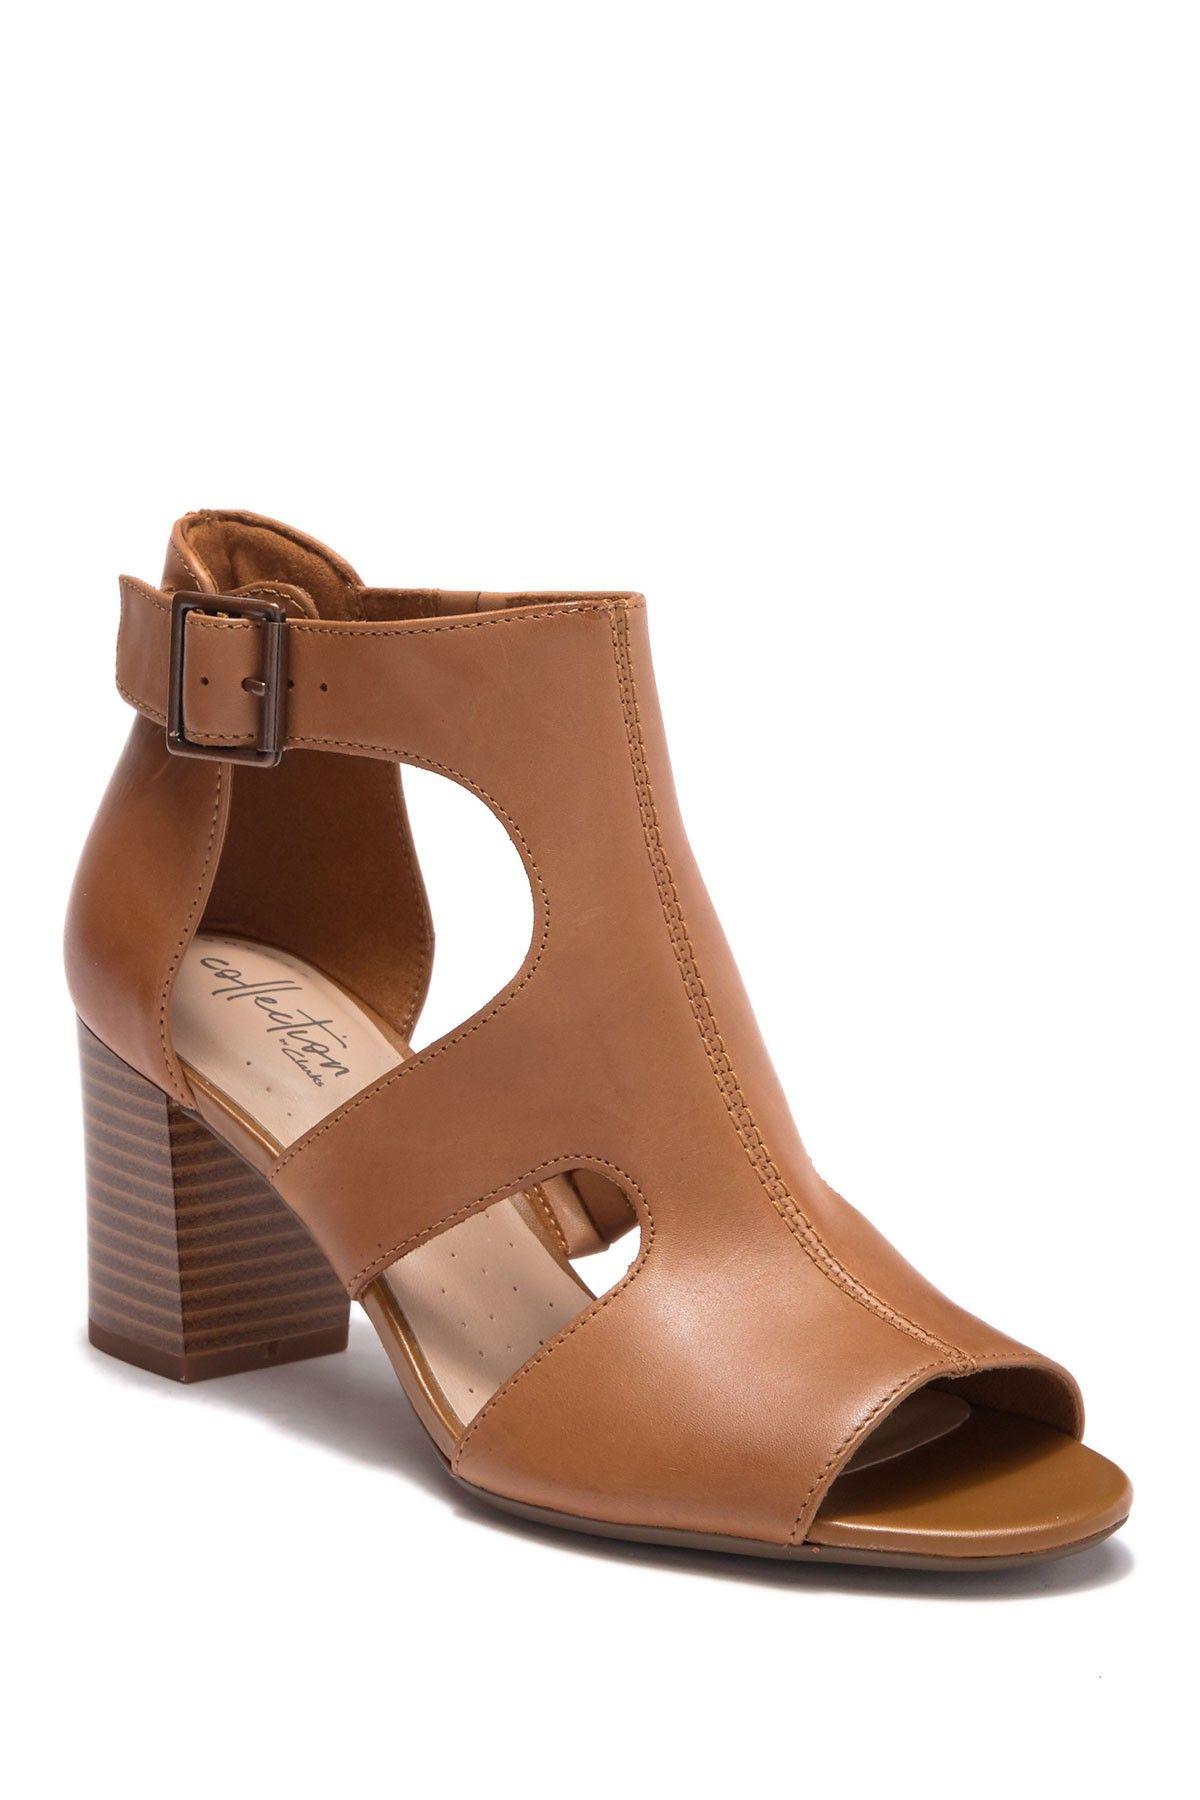 Deva Heidi Heeled Sandal by Clarks on